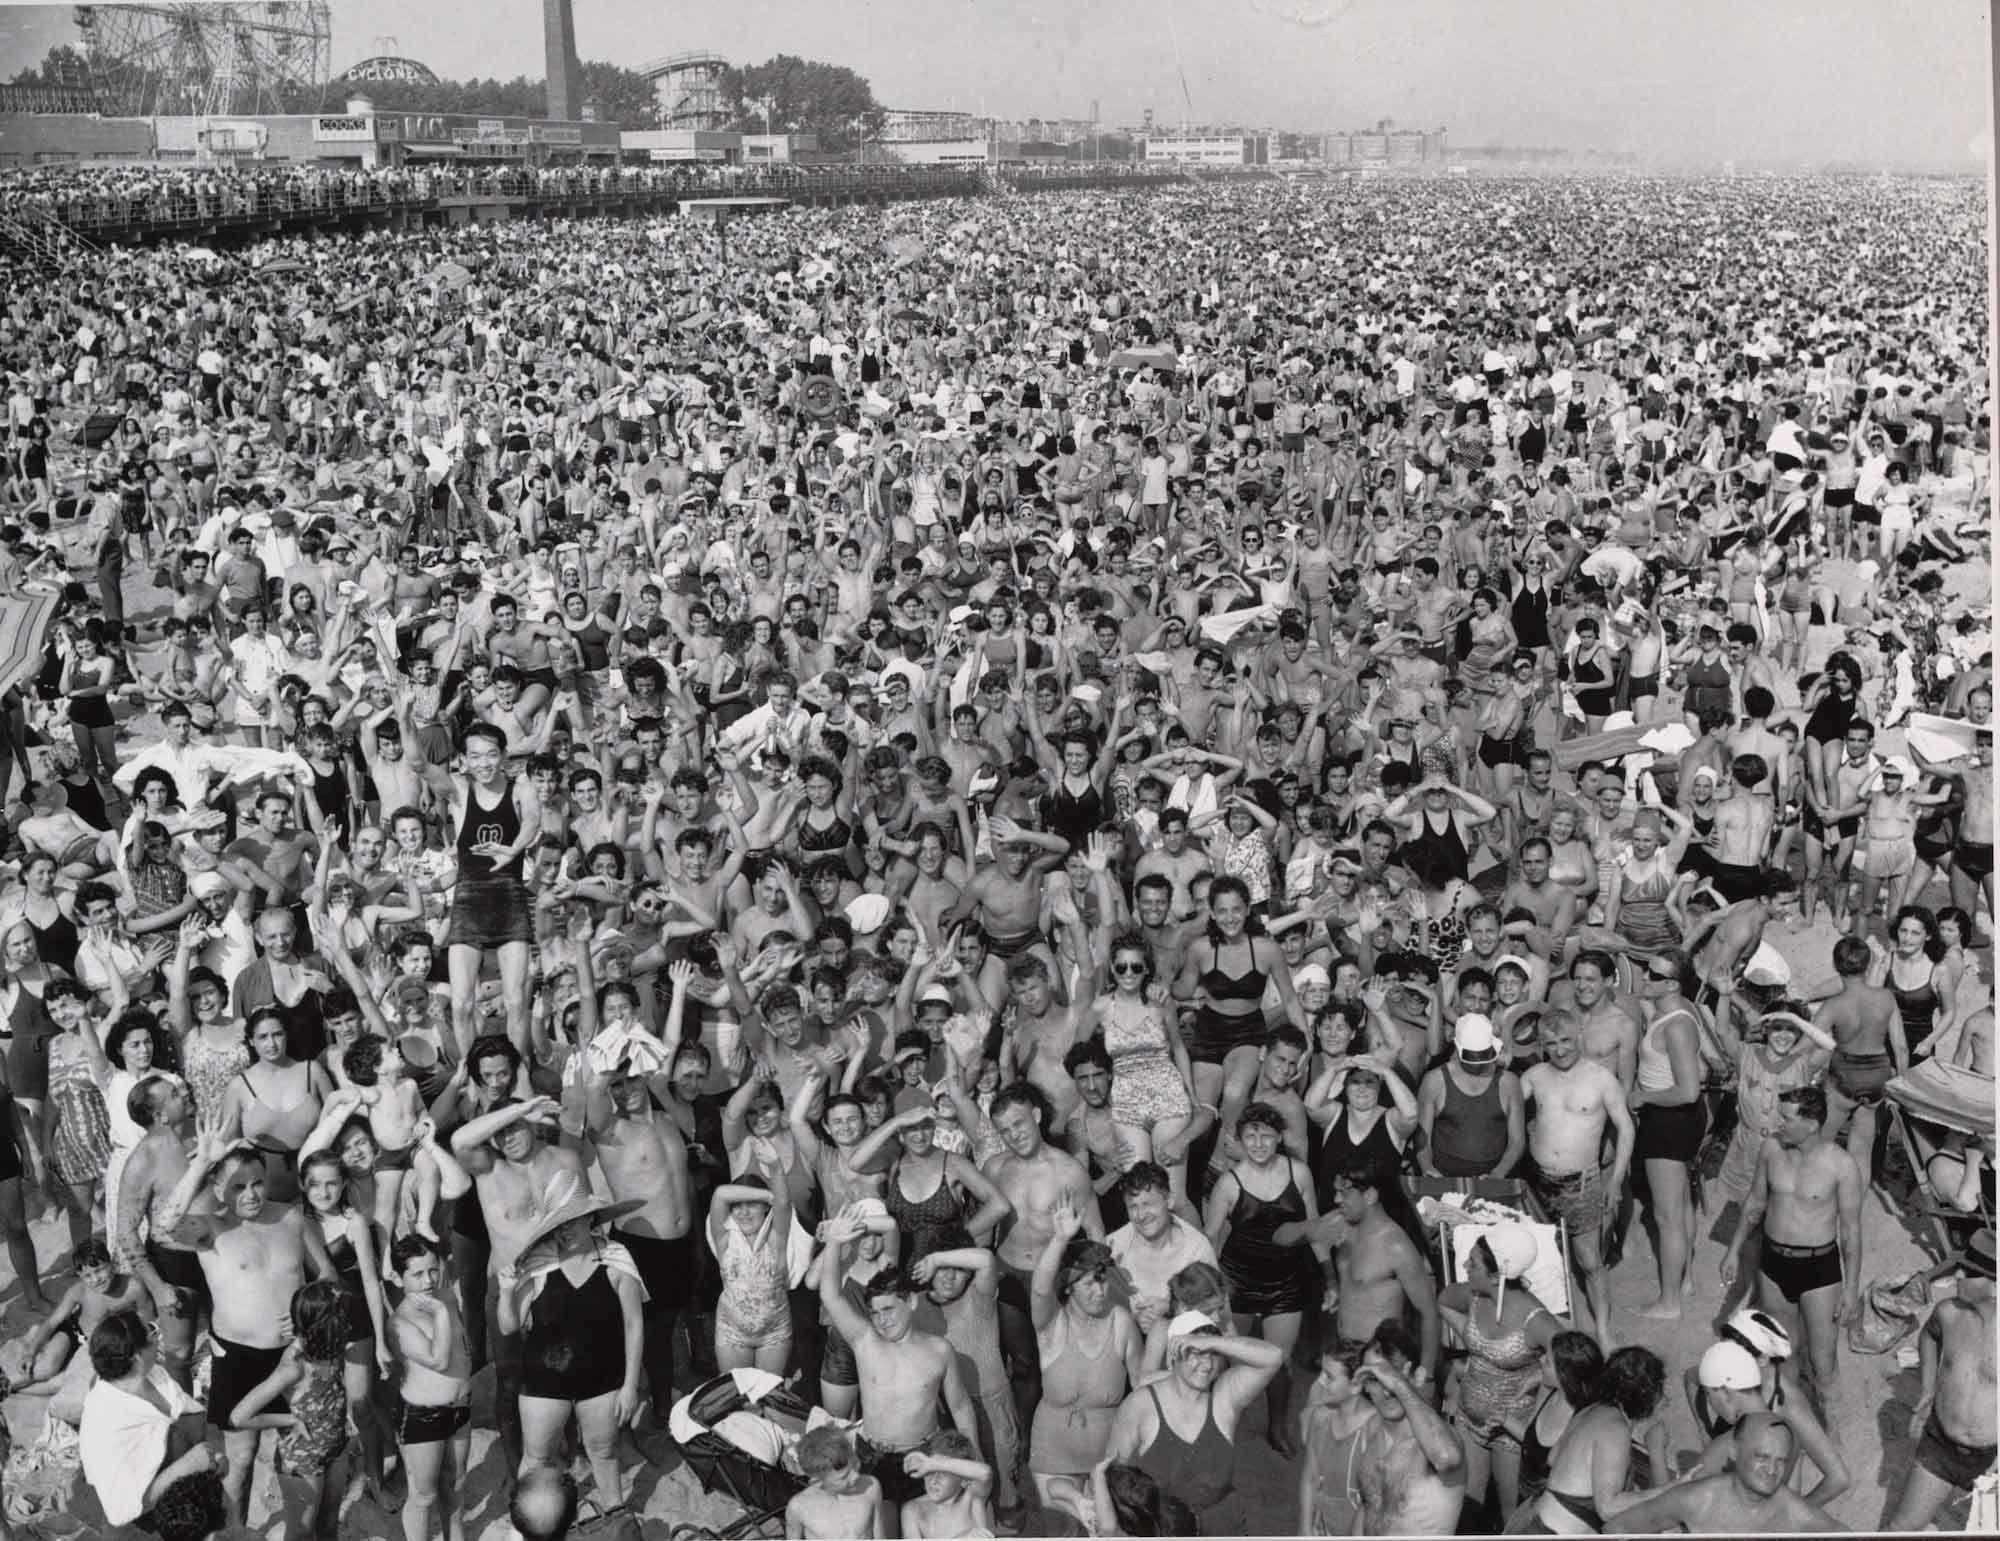 WEEGEE_1940_Coney_Island_Beach_web